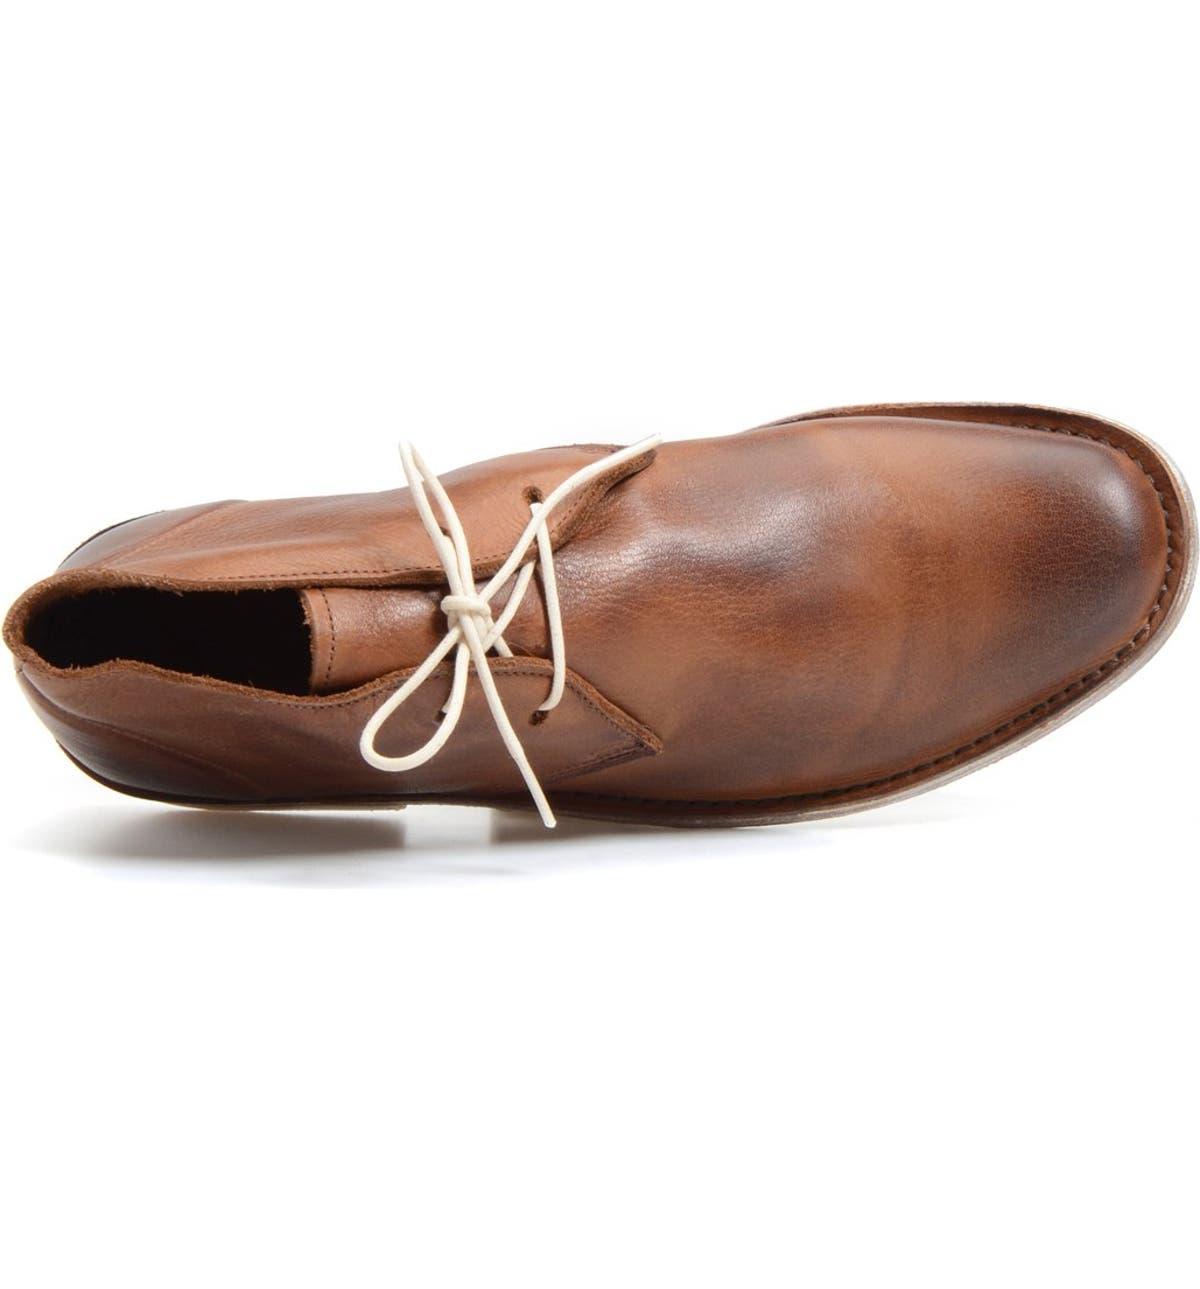 744252d8e0e Vintage Shoe  Sherwood  Chukka Boot (Men)